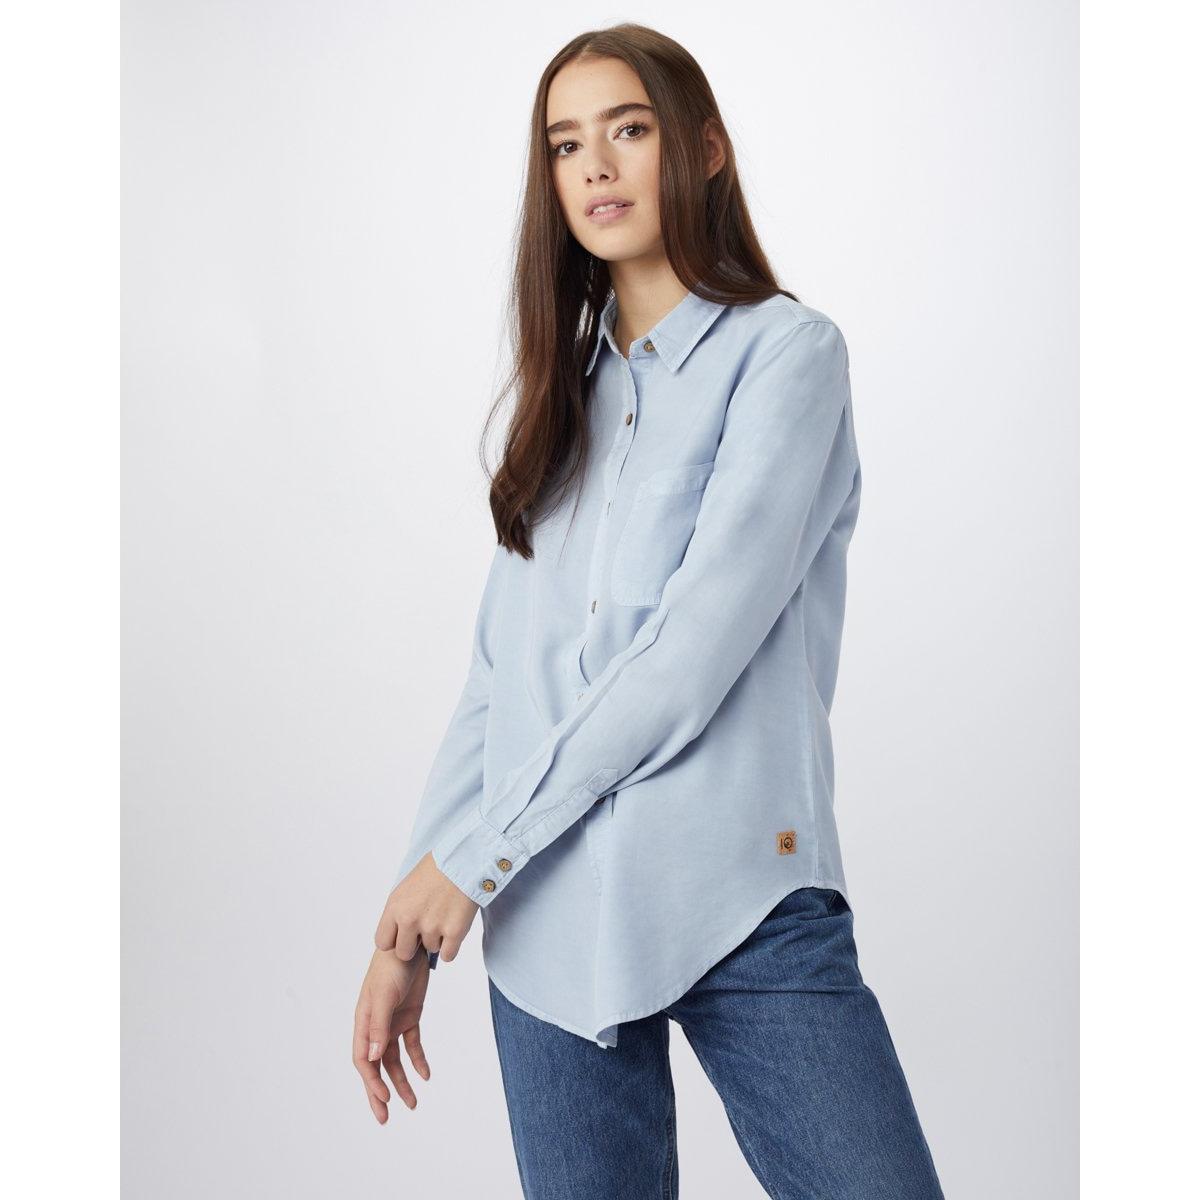 Fernie Button Up EV2 Long Sleeve - Women's